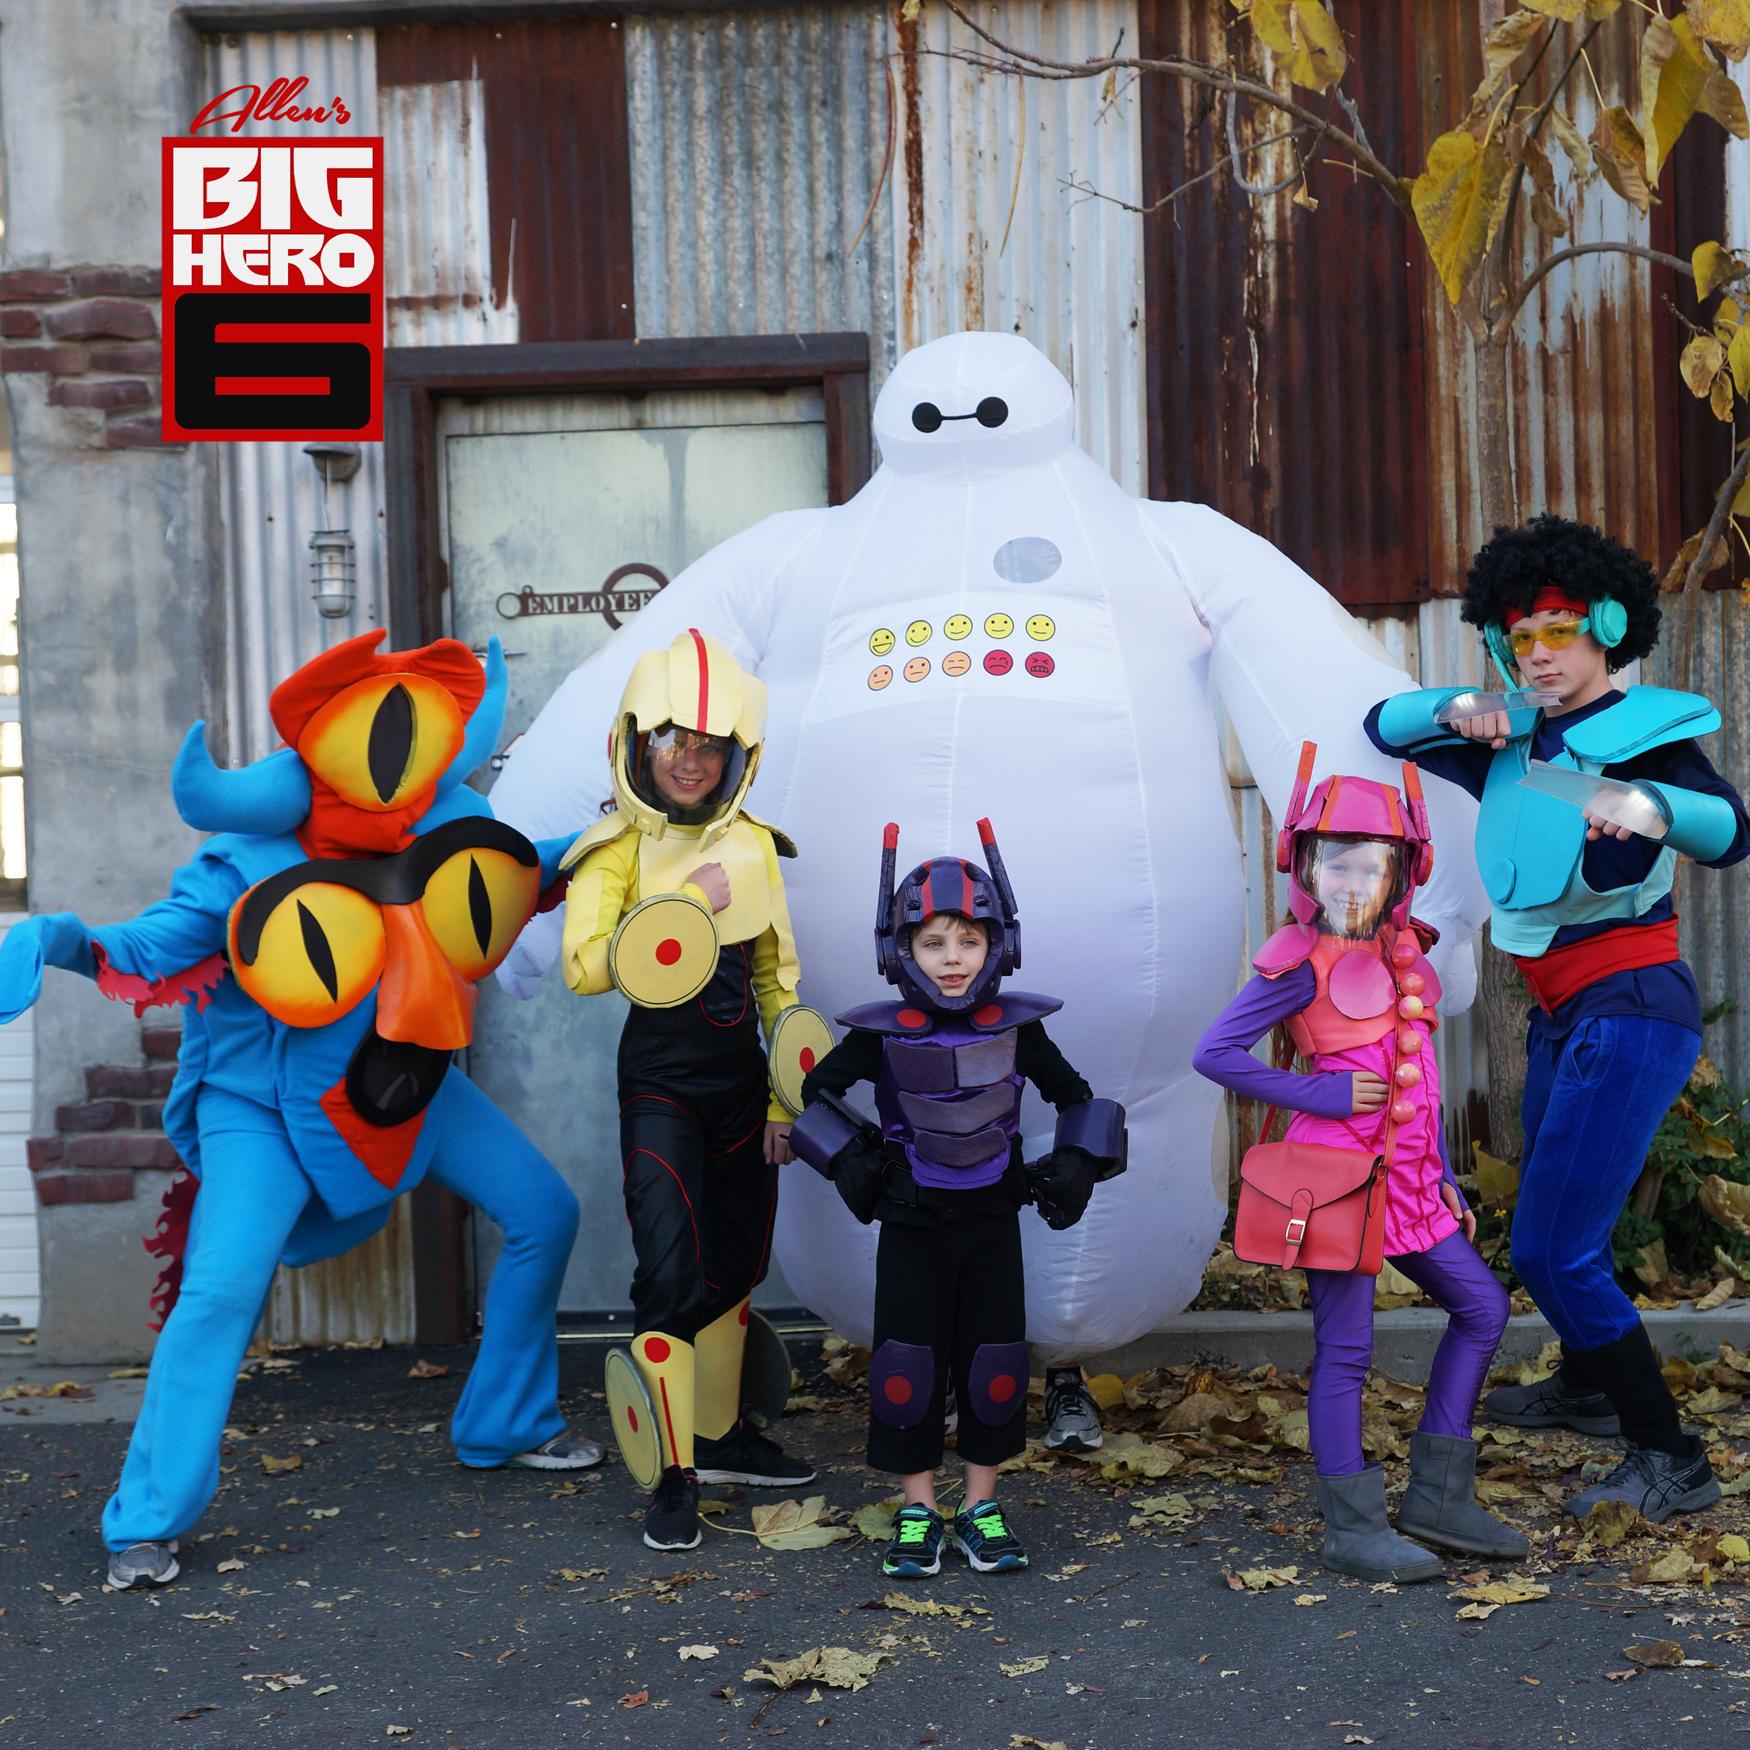 Big Hero 6 the whole gang